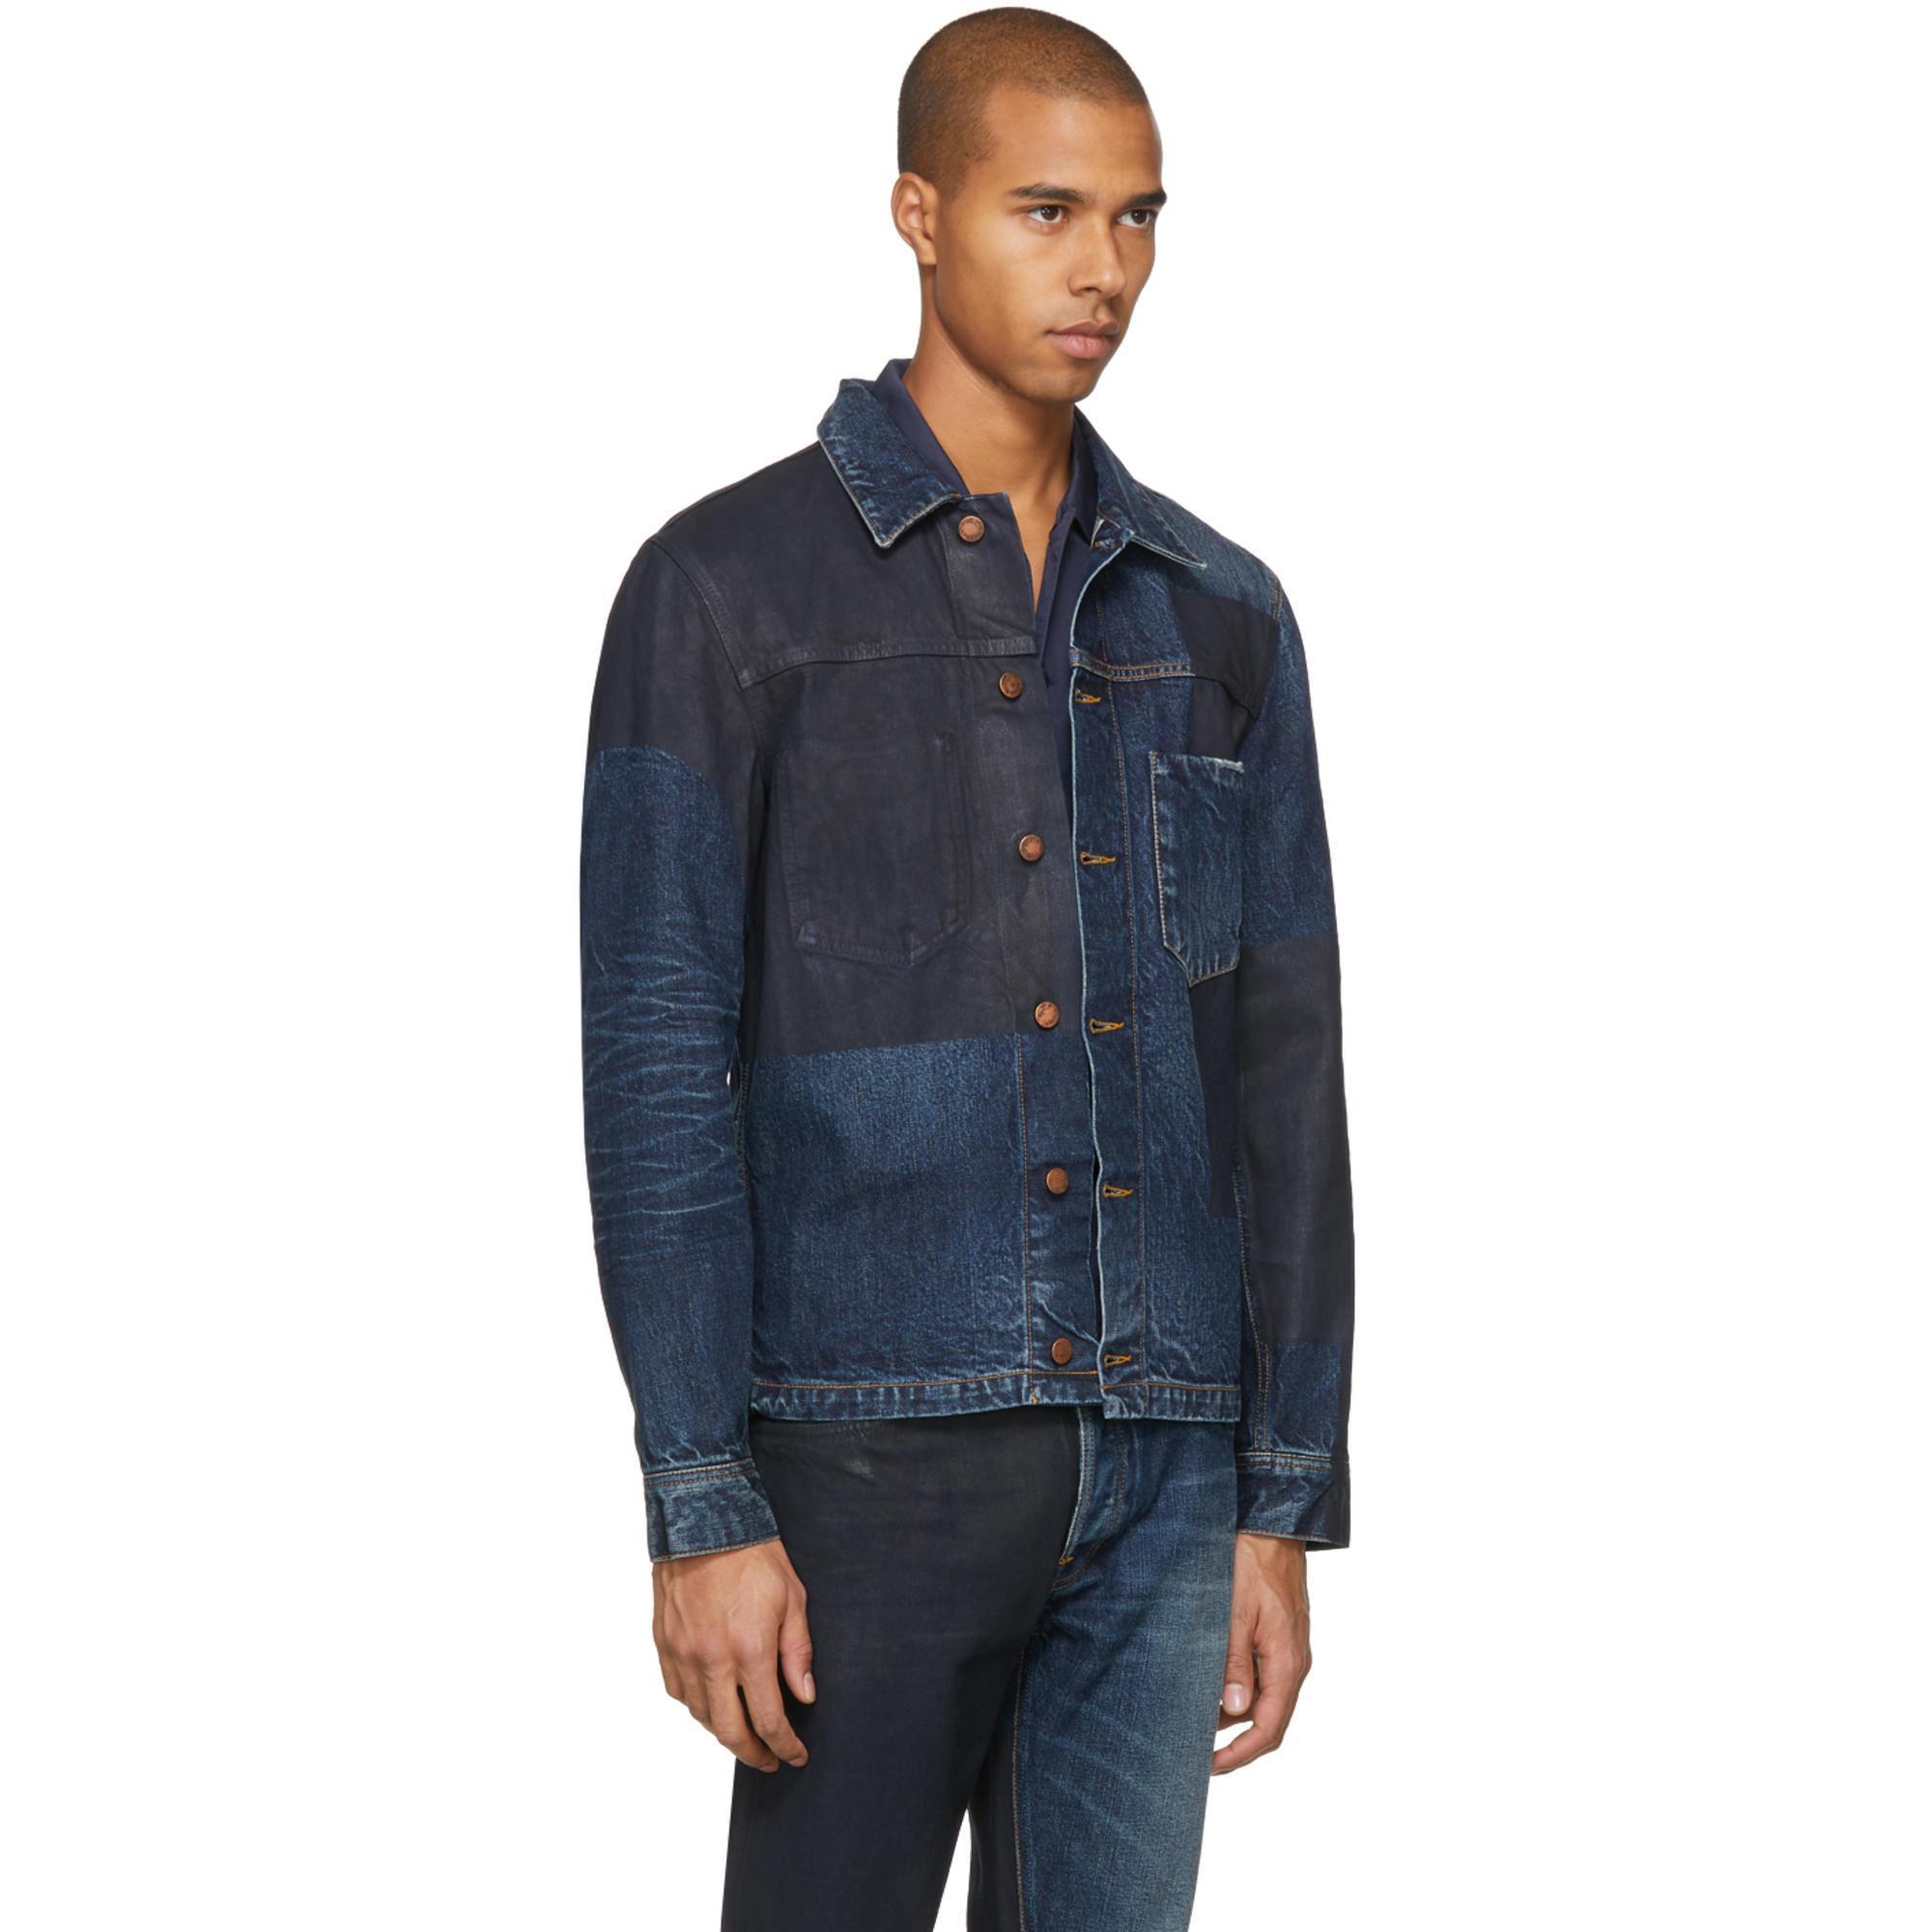 Nudie Jeans Ssense Exclusive Blue Painted Denim Ronny Jacket for Men